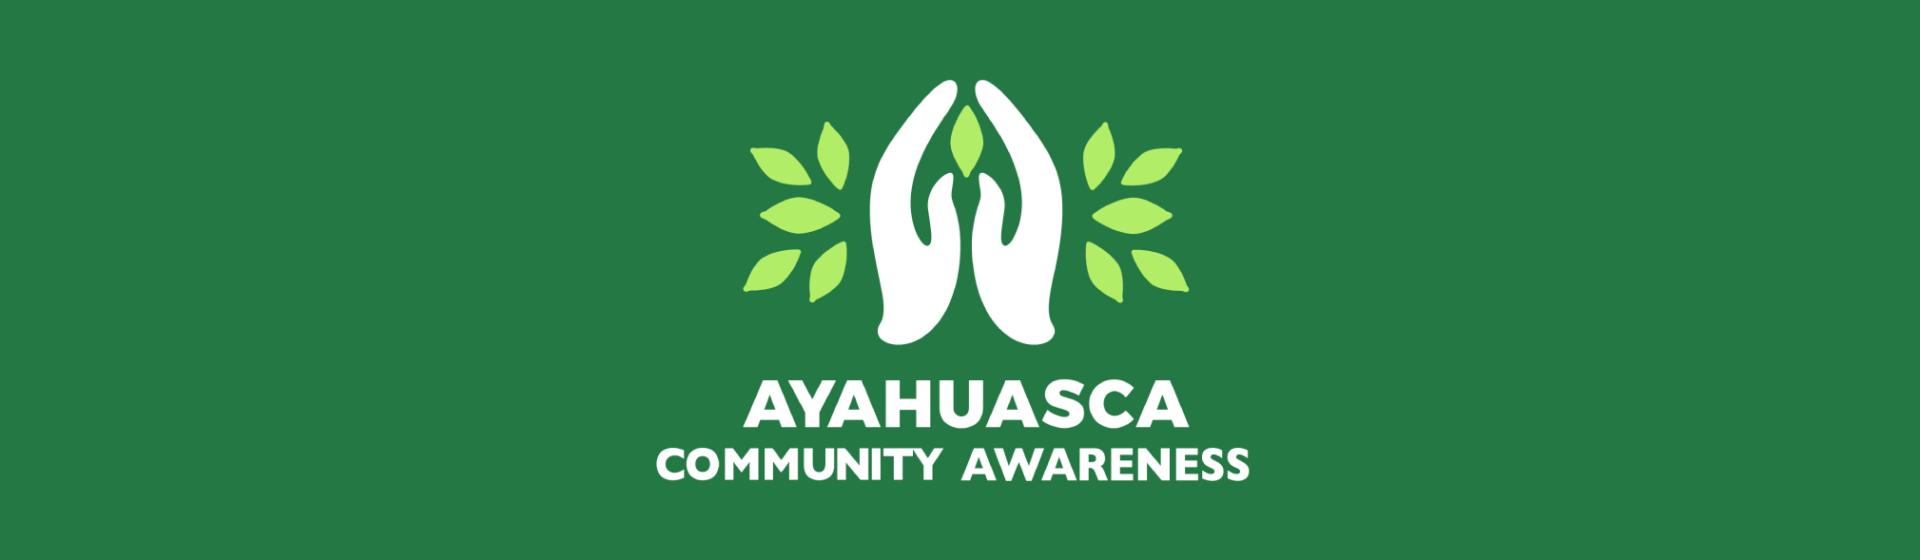 Ayahuasca_Community_Awareness_banner